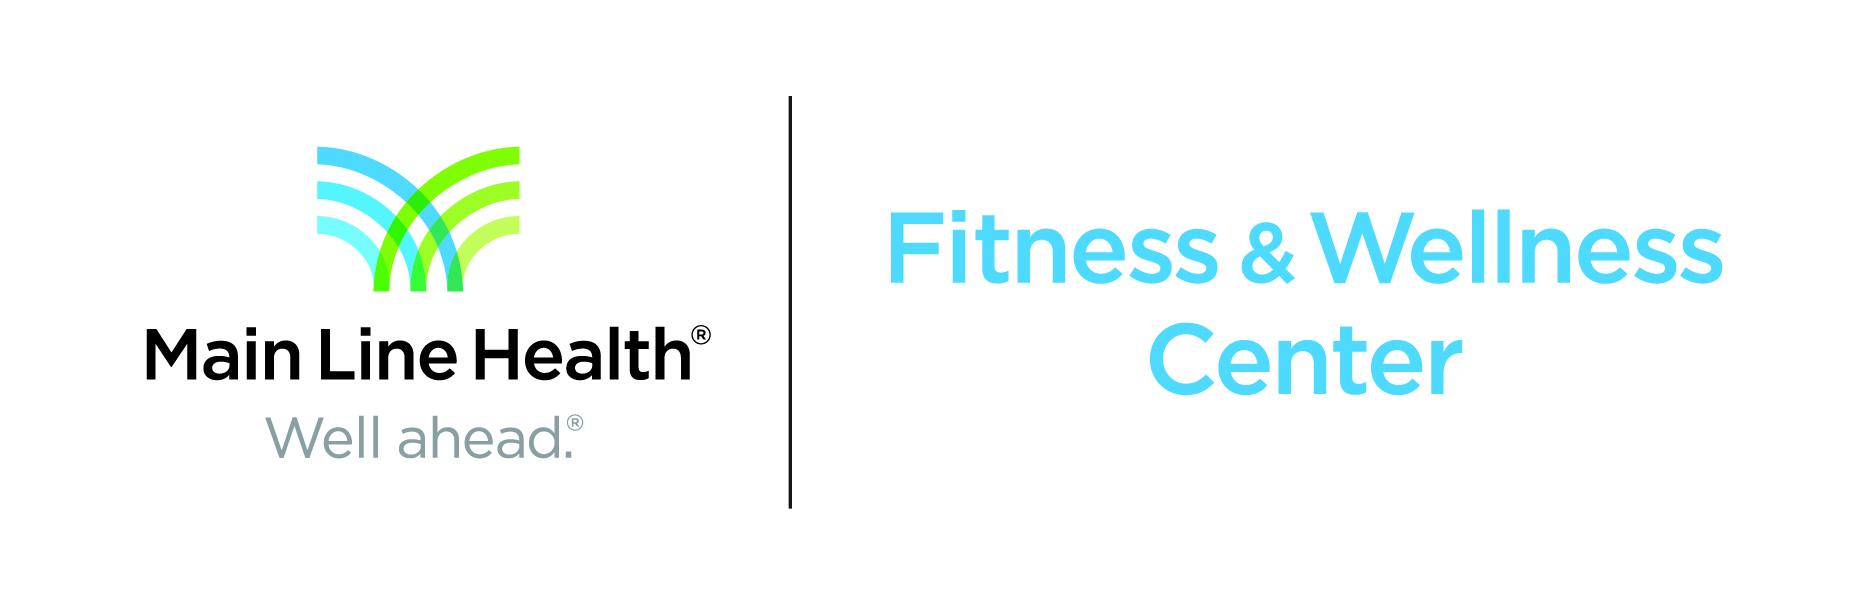 Main Line Health Fitness and Wellness